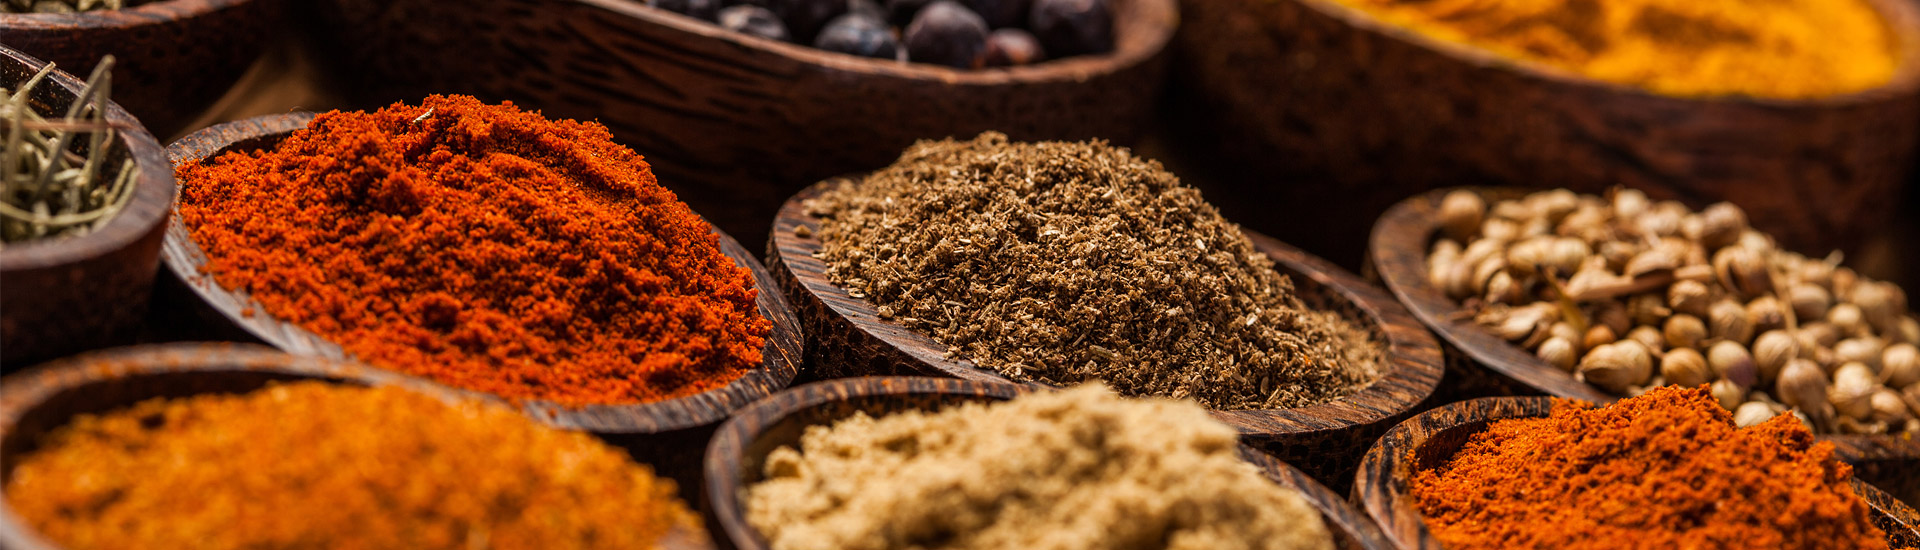 Kryddor i petburk